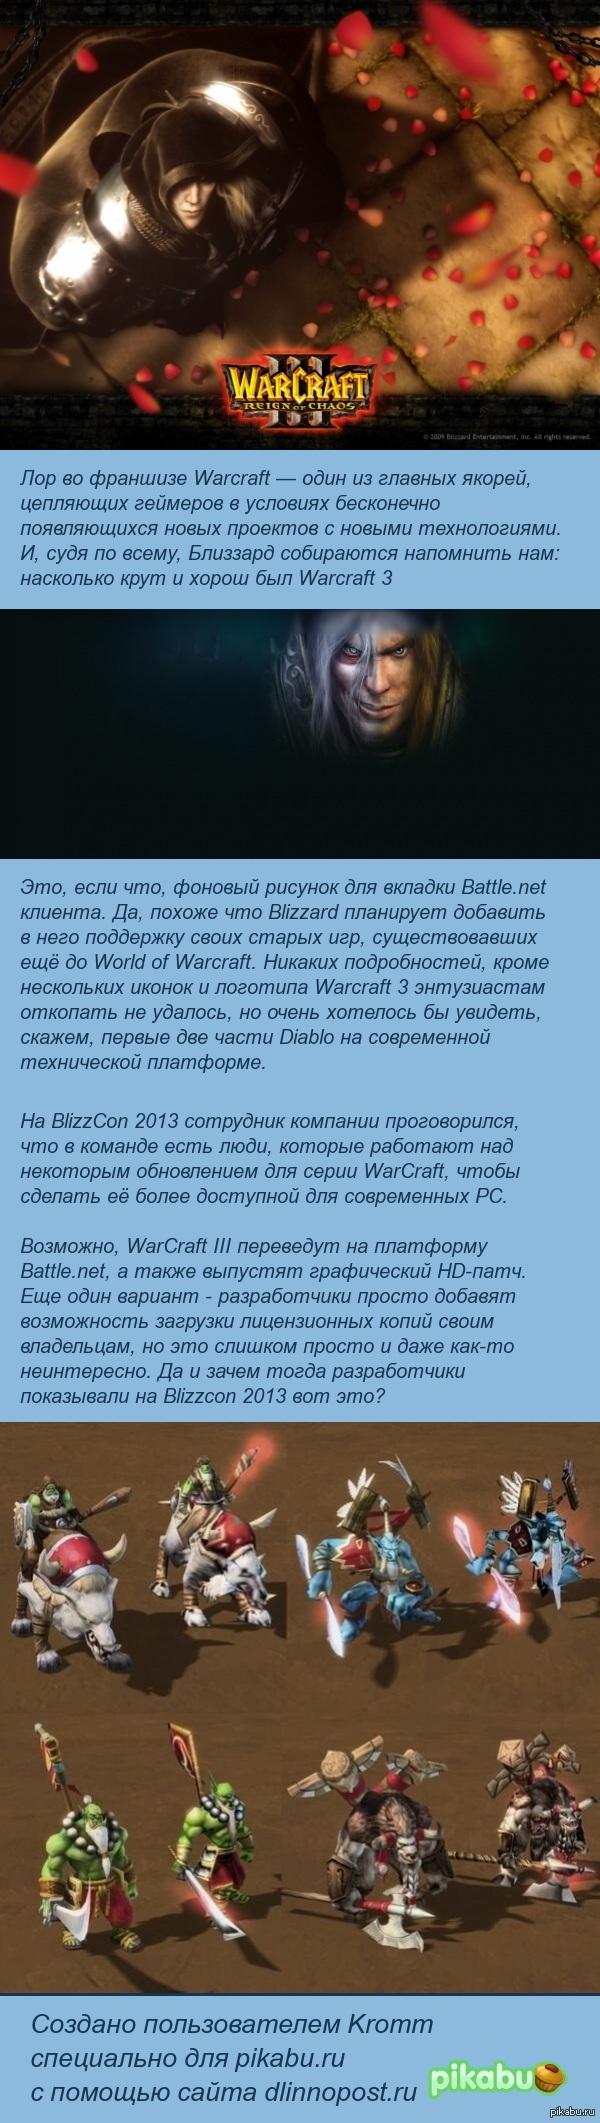 WarCraft III в клиенте Battle.net